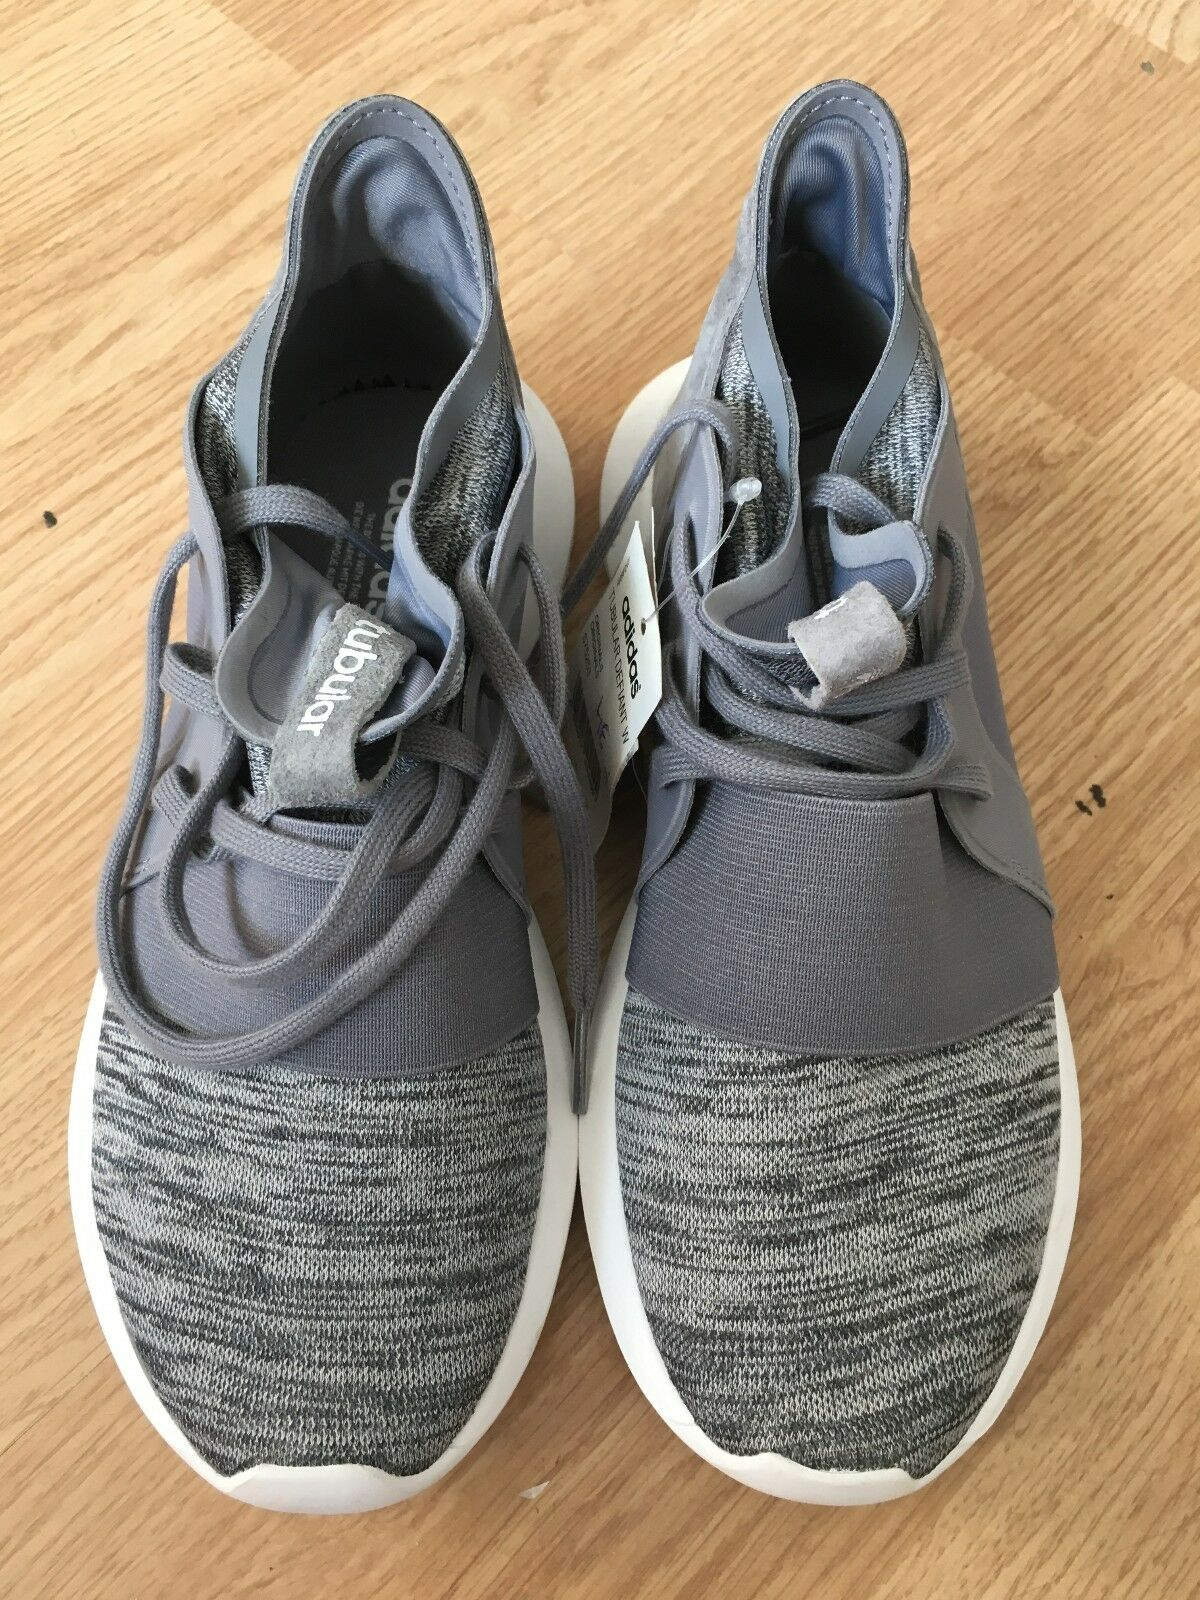 Adidas Original Tubular Defiant Sz:5.5 Gray S75253 S75253 Gray Weiß Primeknit Rare 9c20cb